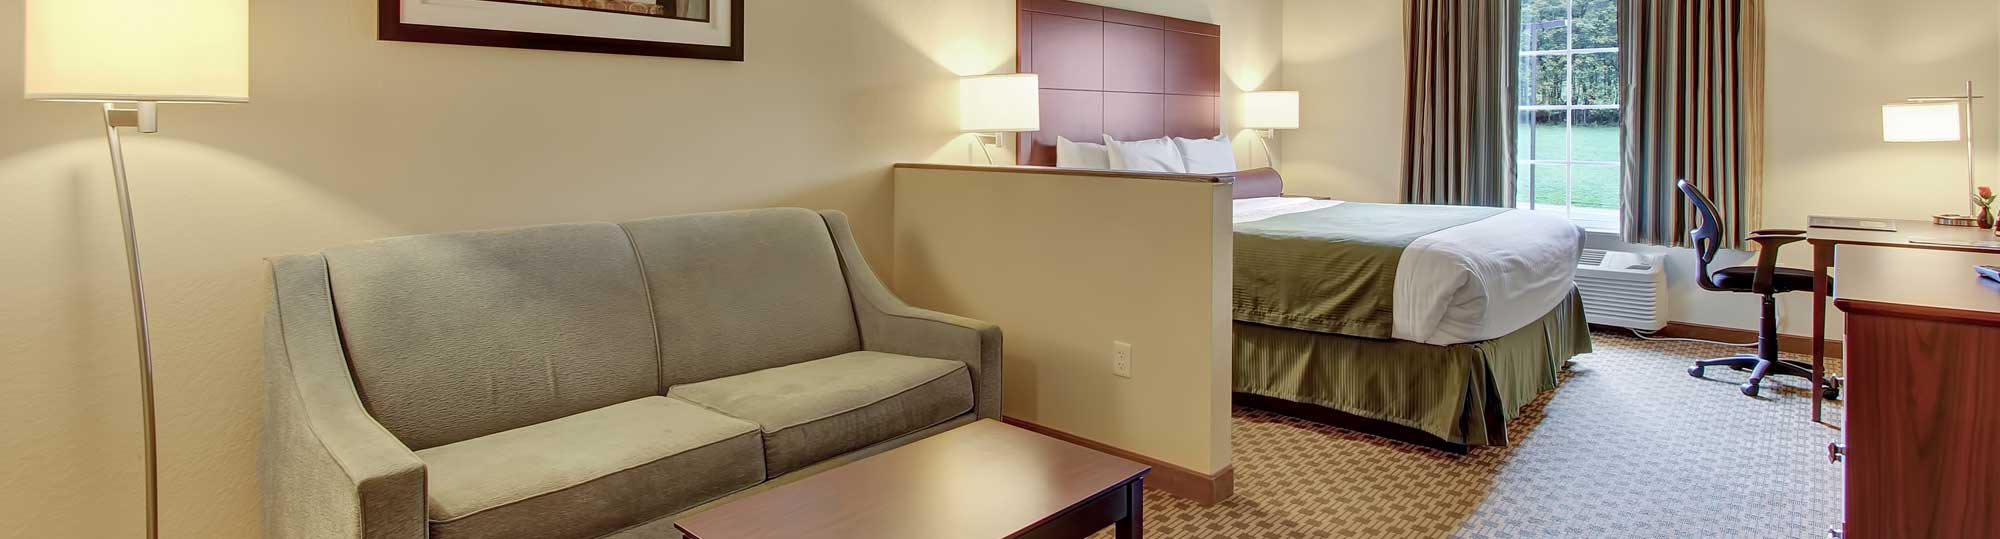 Cobblestone Hotel and Suites Waynesboro